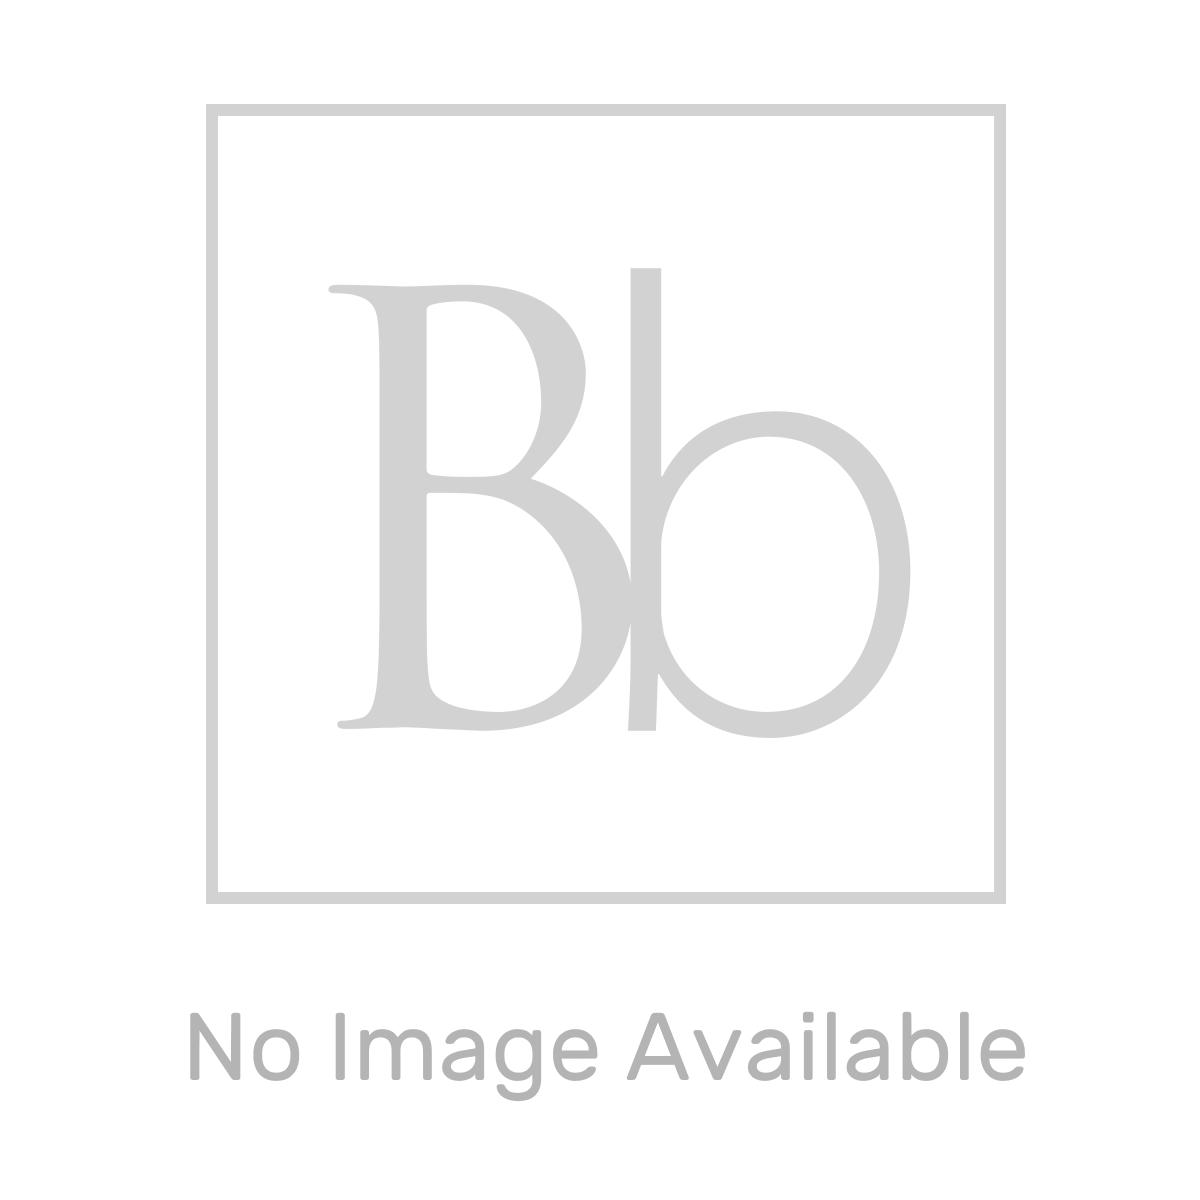 RAK Cubis Black Toilet Brush with Holder Measurements